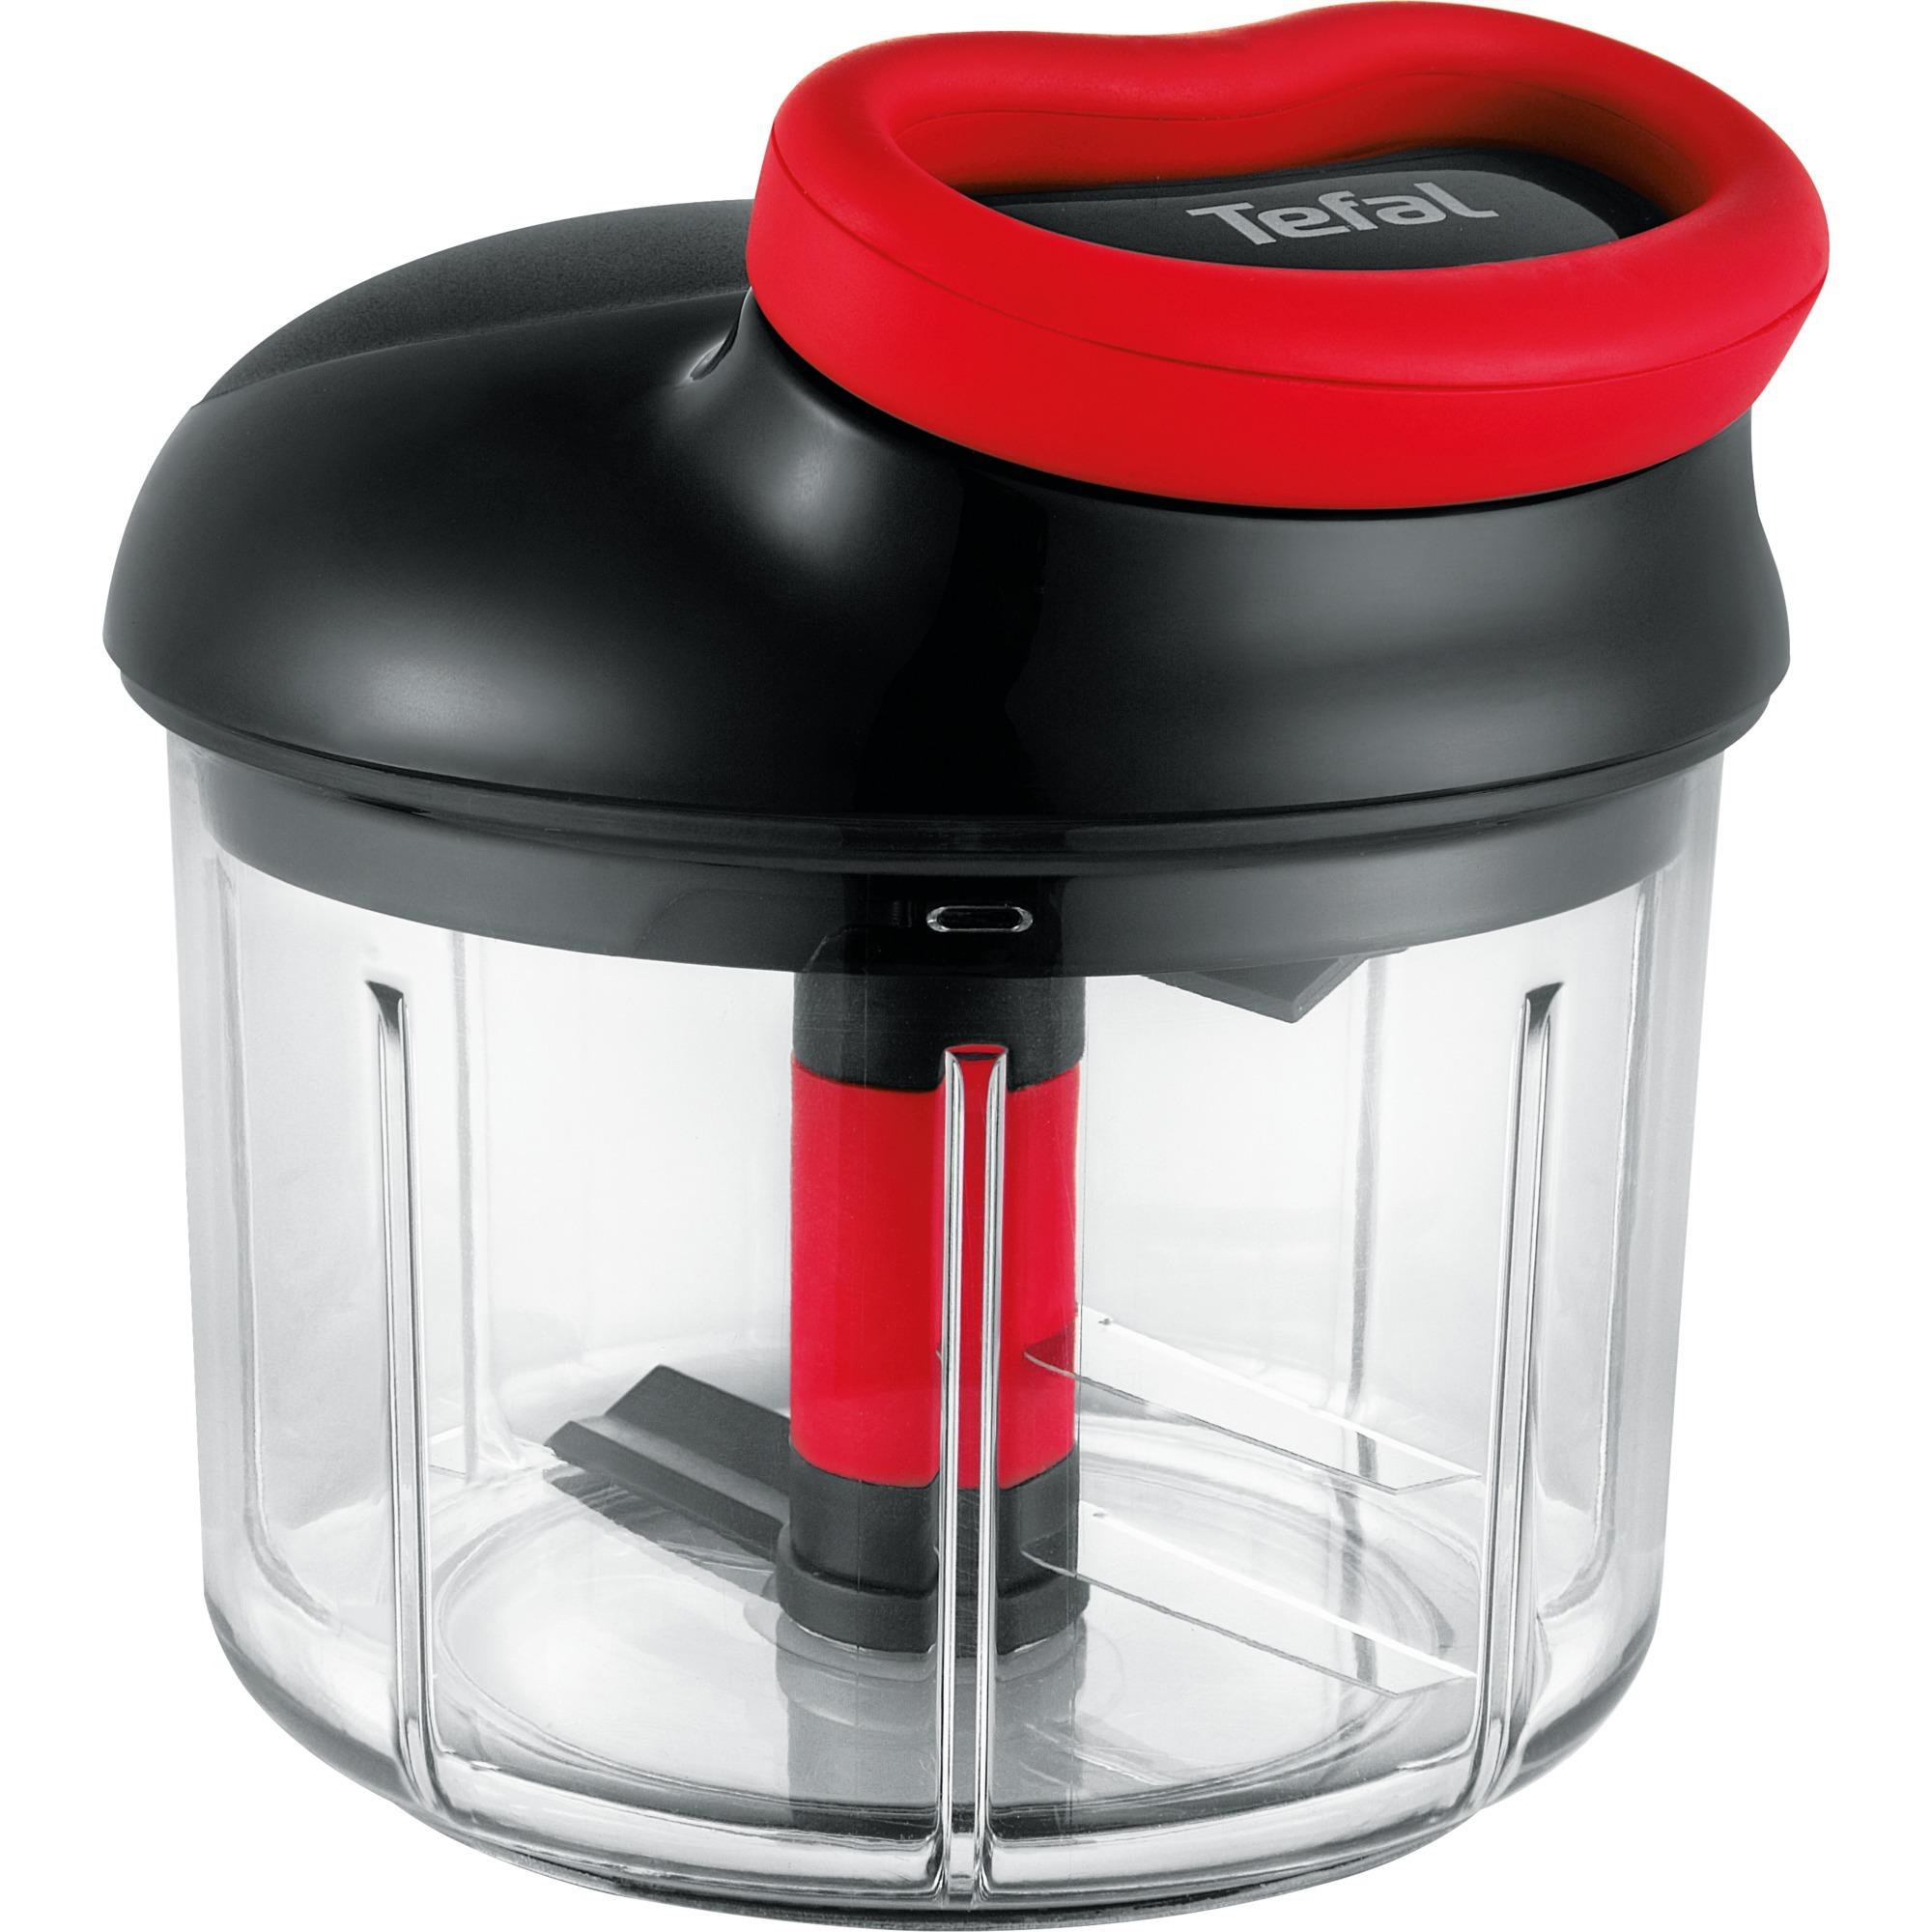 K09811 picadora manual de alimentos Negro, Transparente, Trituradora